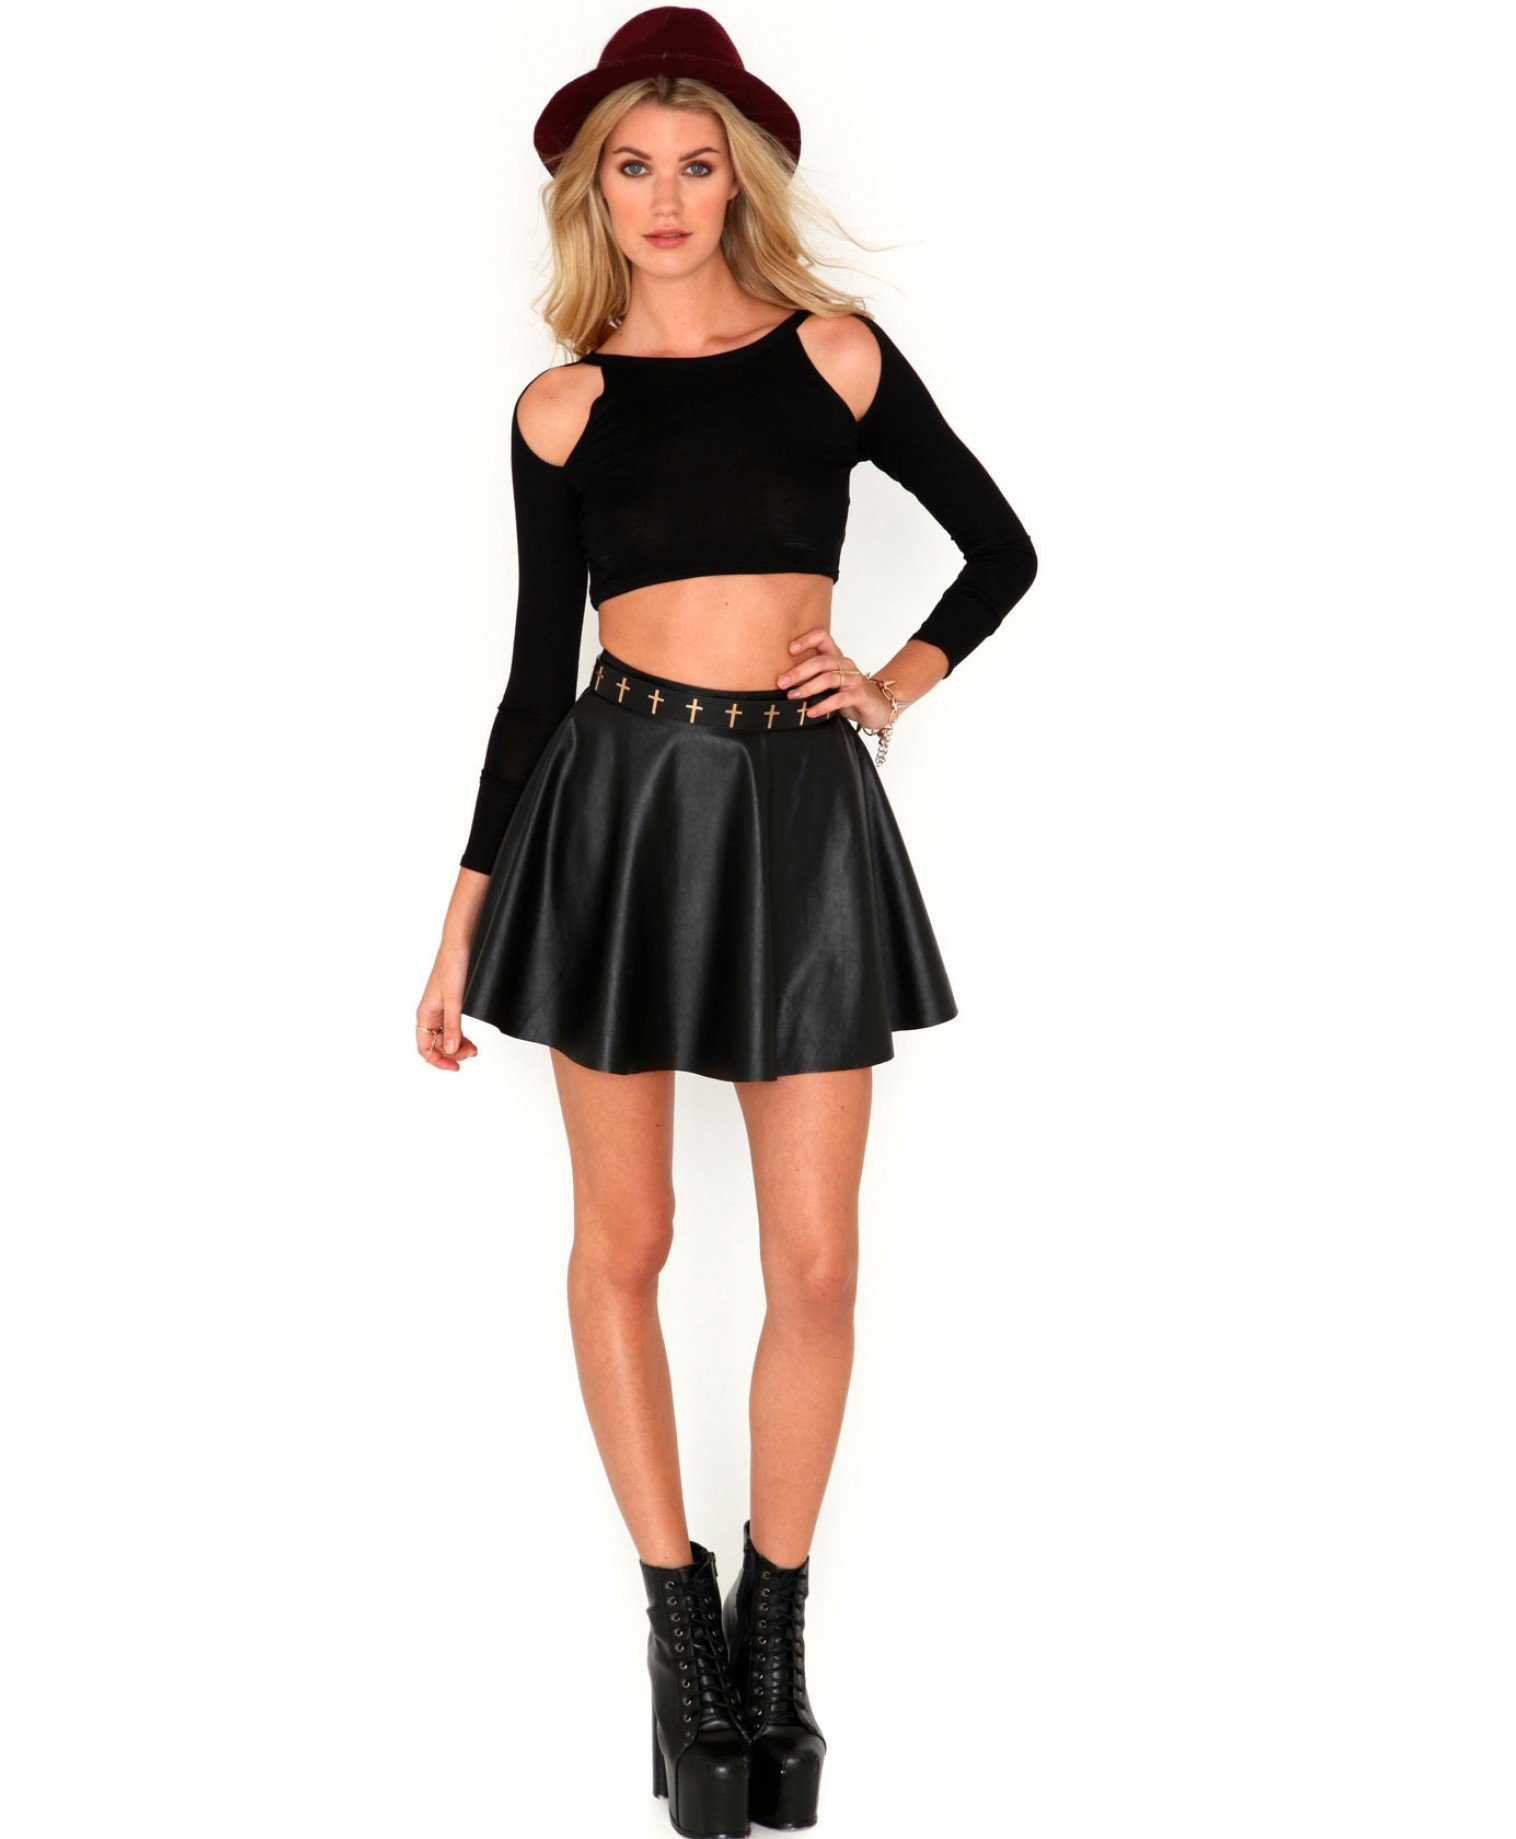 1d8744153c53f0 Missguided Liama Cut Out Shoulder Crop Top in Black in Black - Lyst